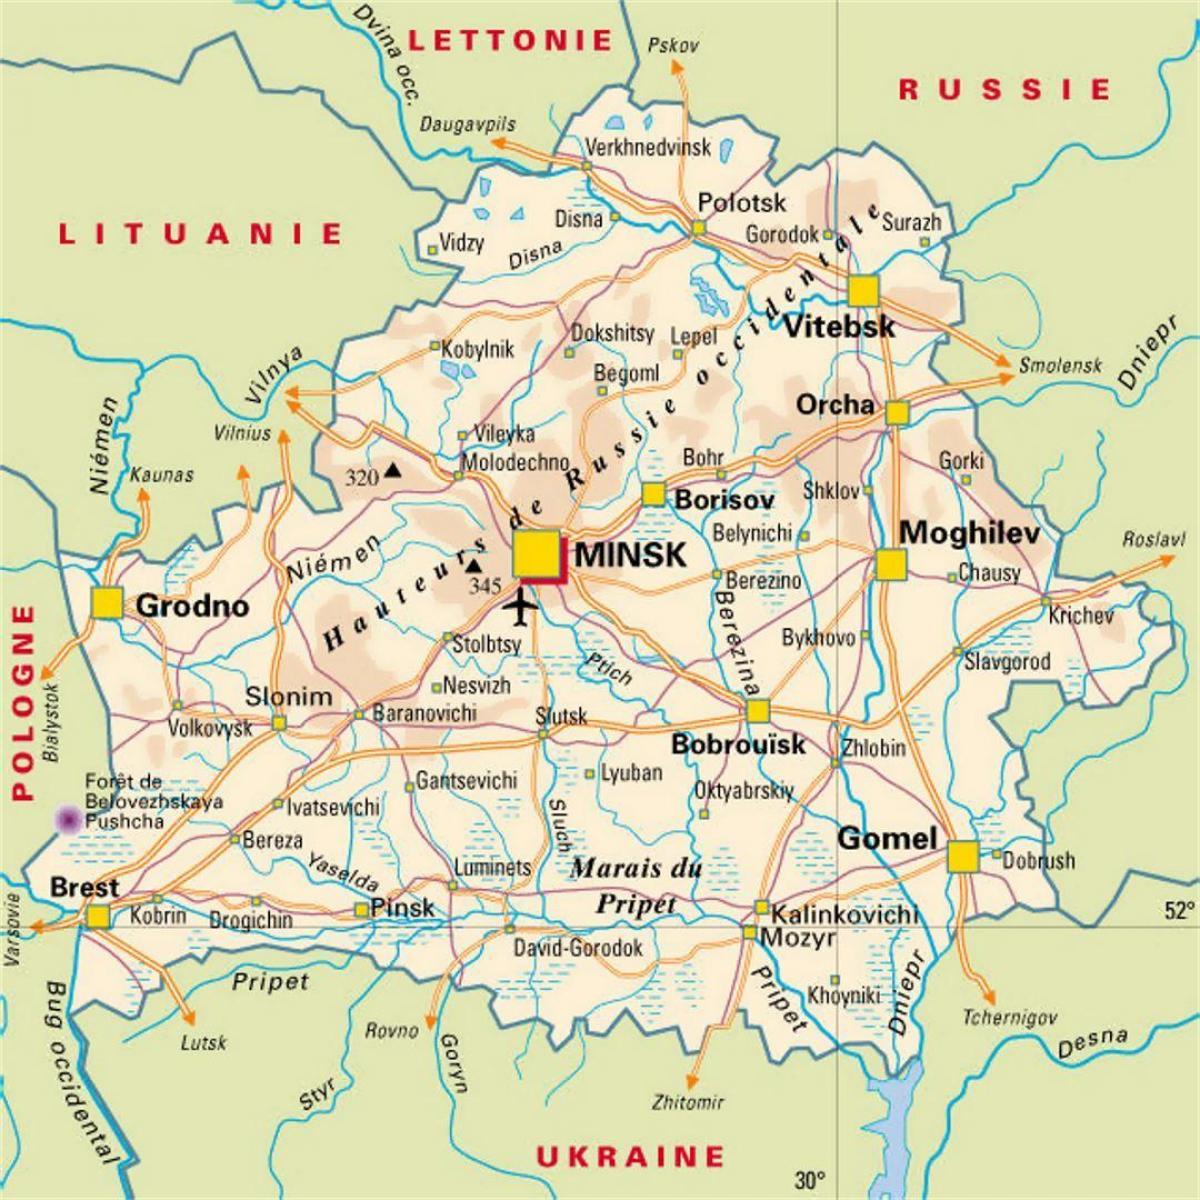 Bjelorusiji Gradova Mapu Mapa Bjelorusiji Gradova Istocne